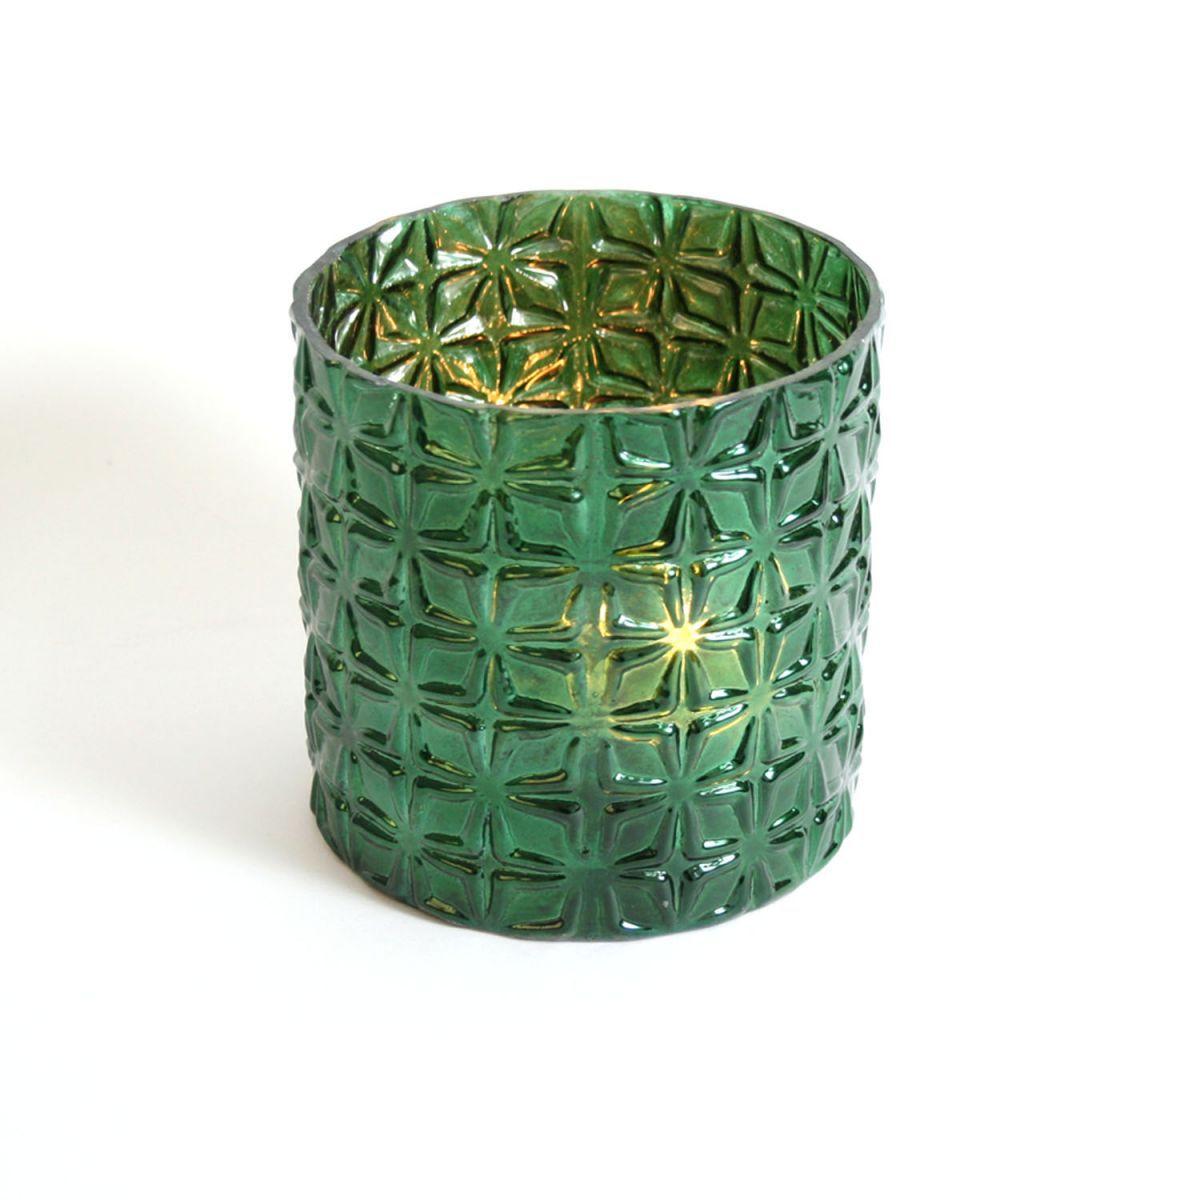 waxinehouder glas groen 13x13 cm